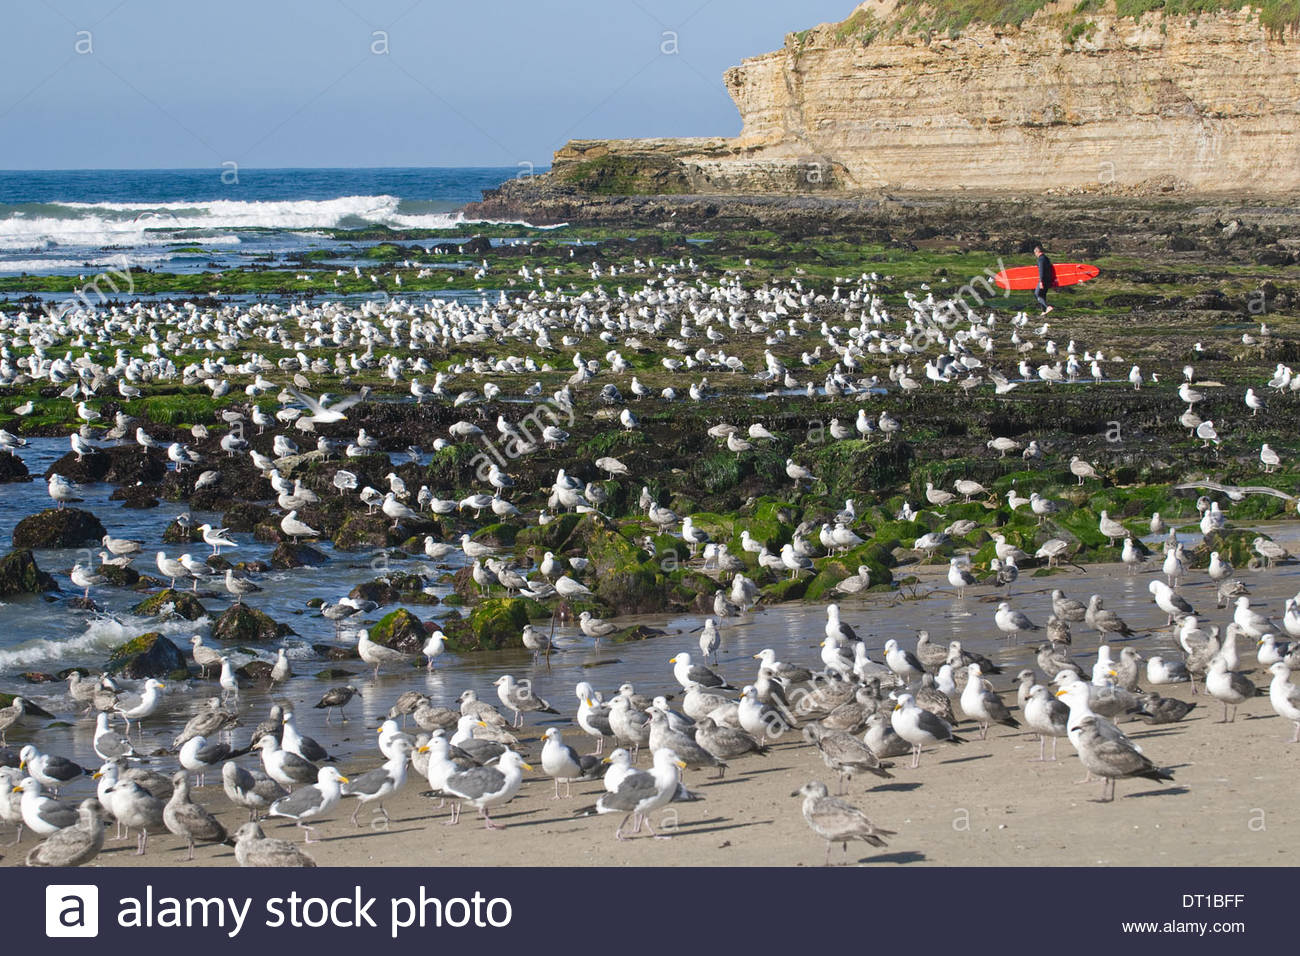 Four Mile Beach Monterey Bay California USA Surfer on beach bird colony of gulls - Stock Image